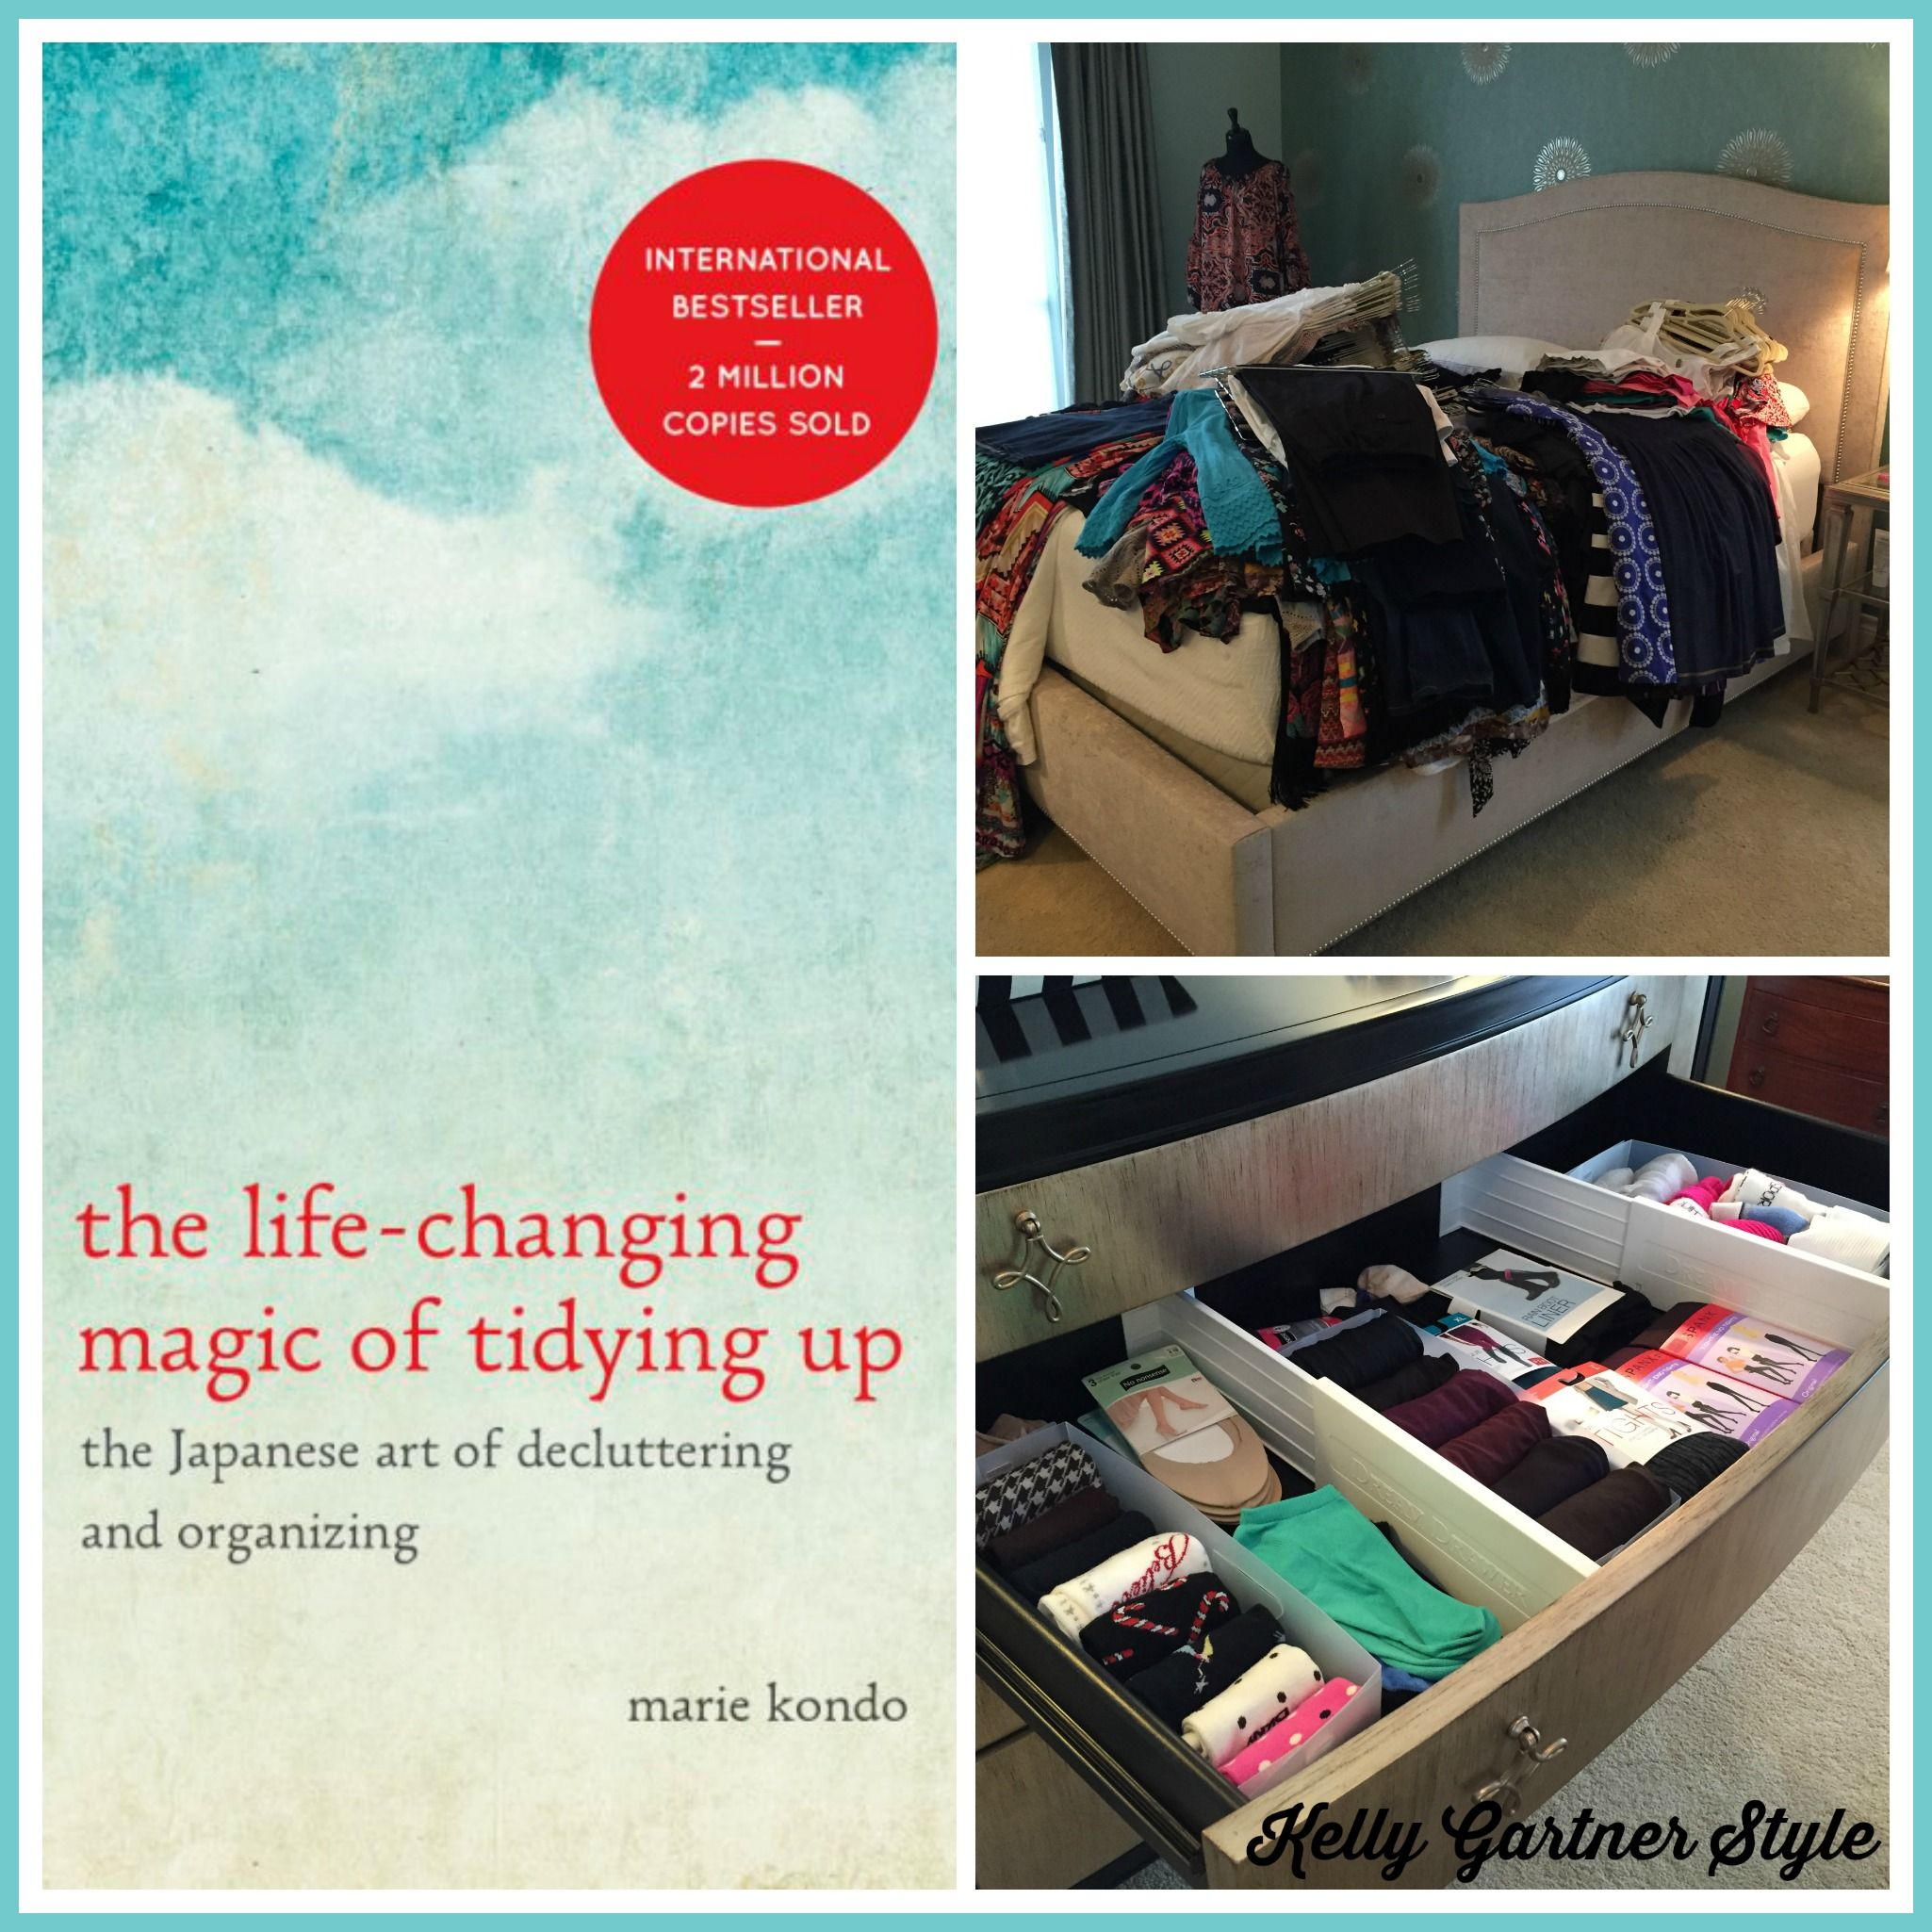 Tidying Up The Konmari Way An Introduction Marie Kondo Developed The Konmari Method Of Tidying